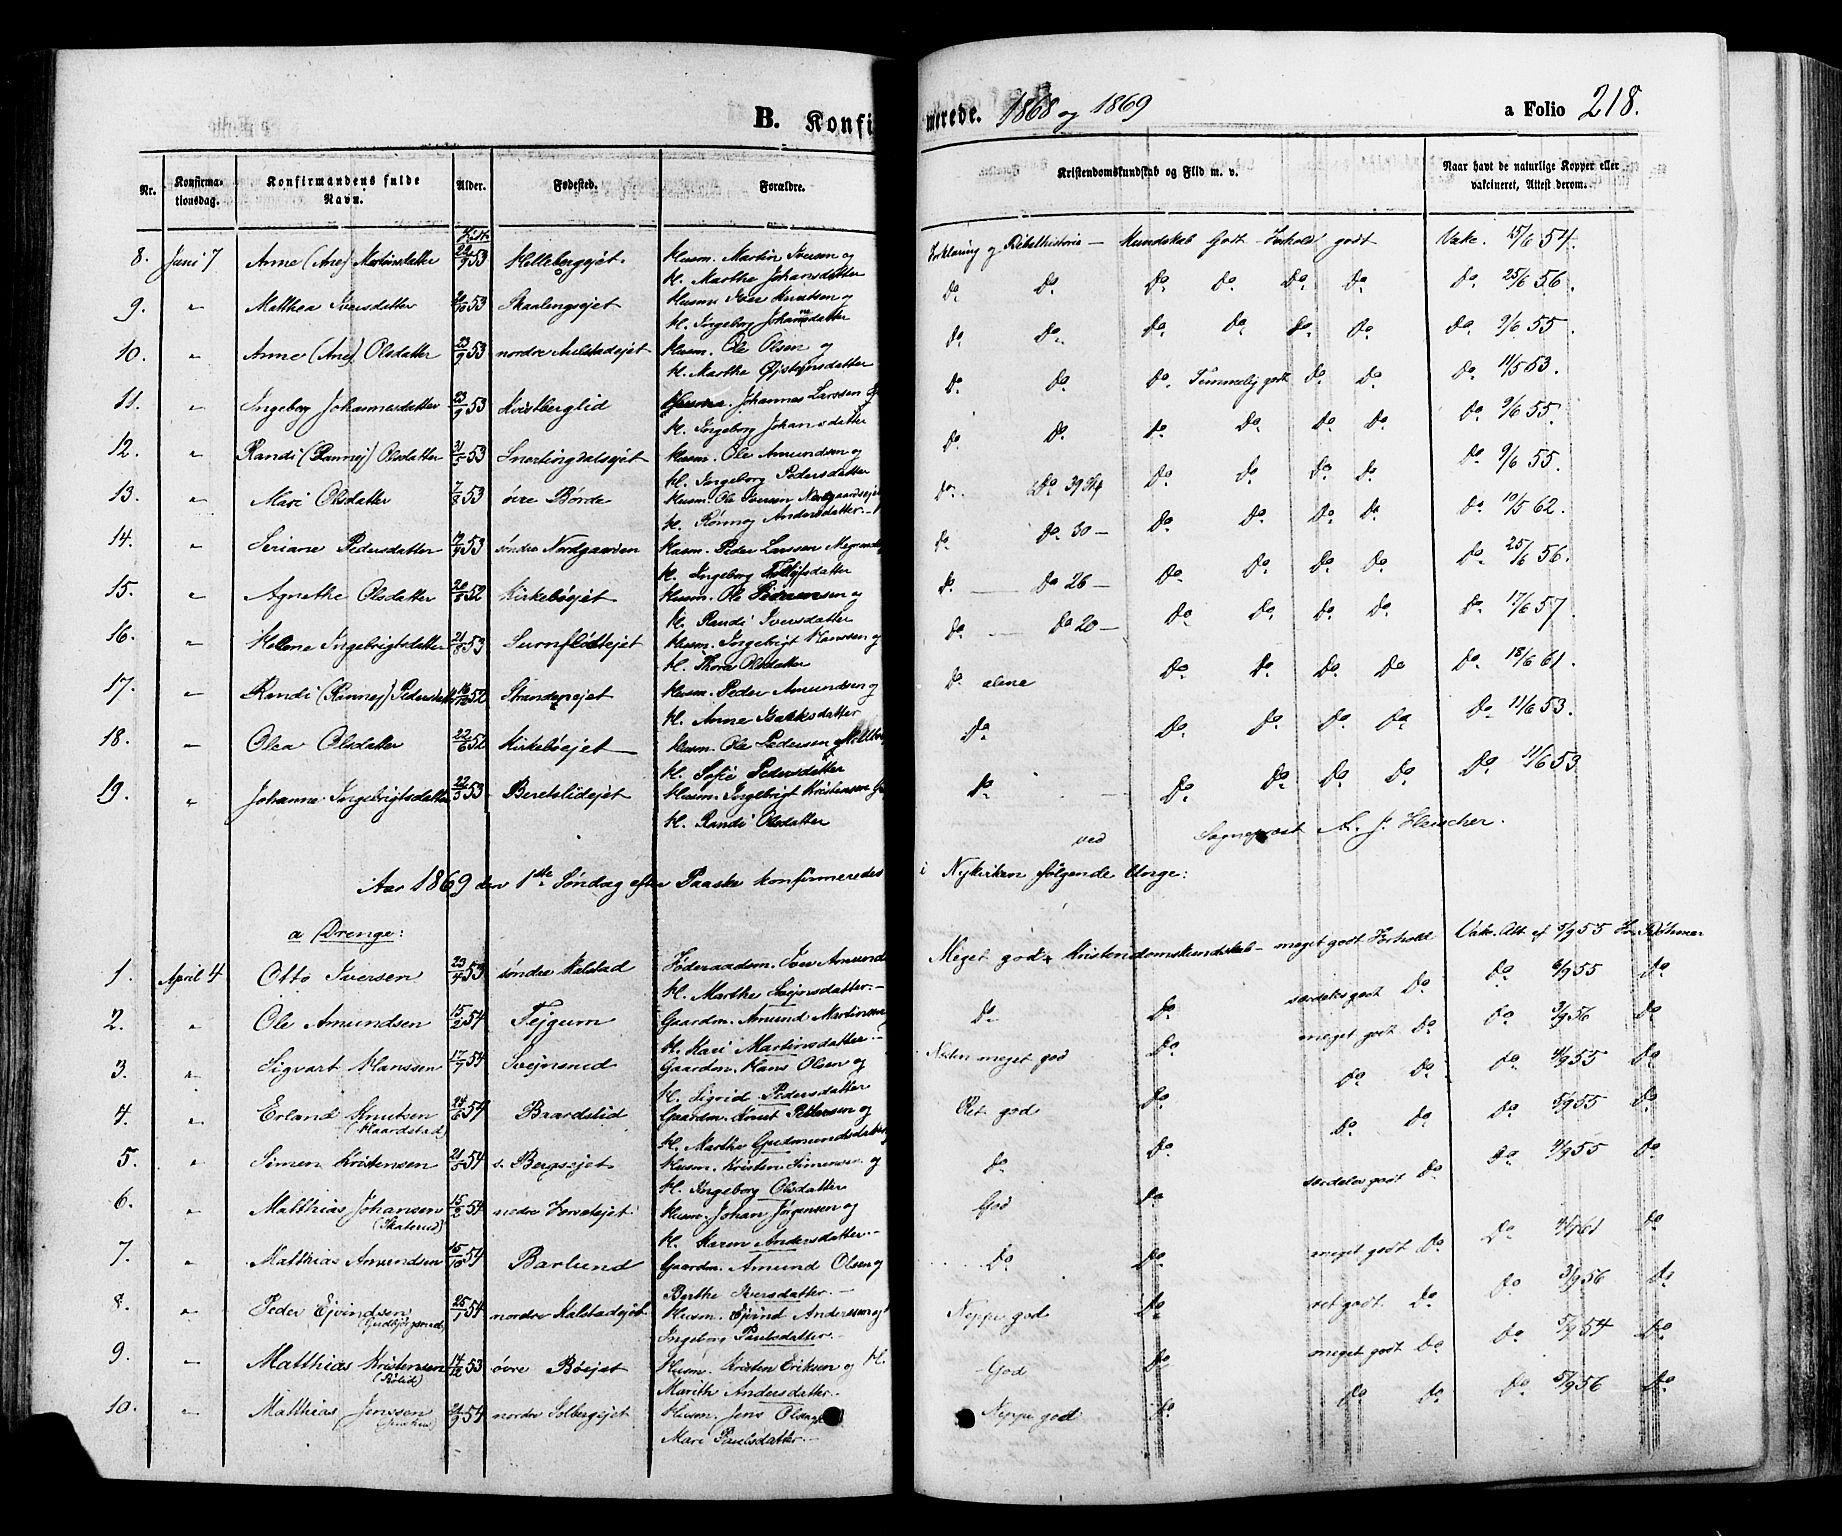 SAH, Gausdal prestekontor, Ministerialbok nr. 10, 1867-1886, s. 218